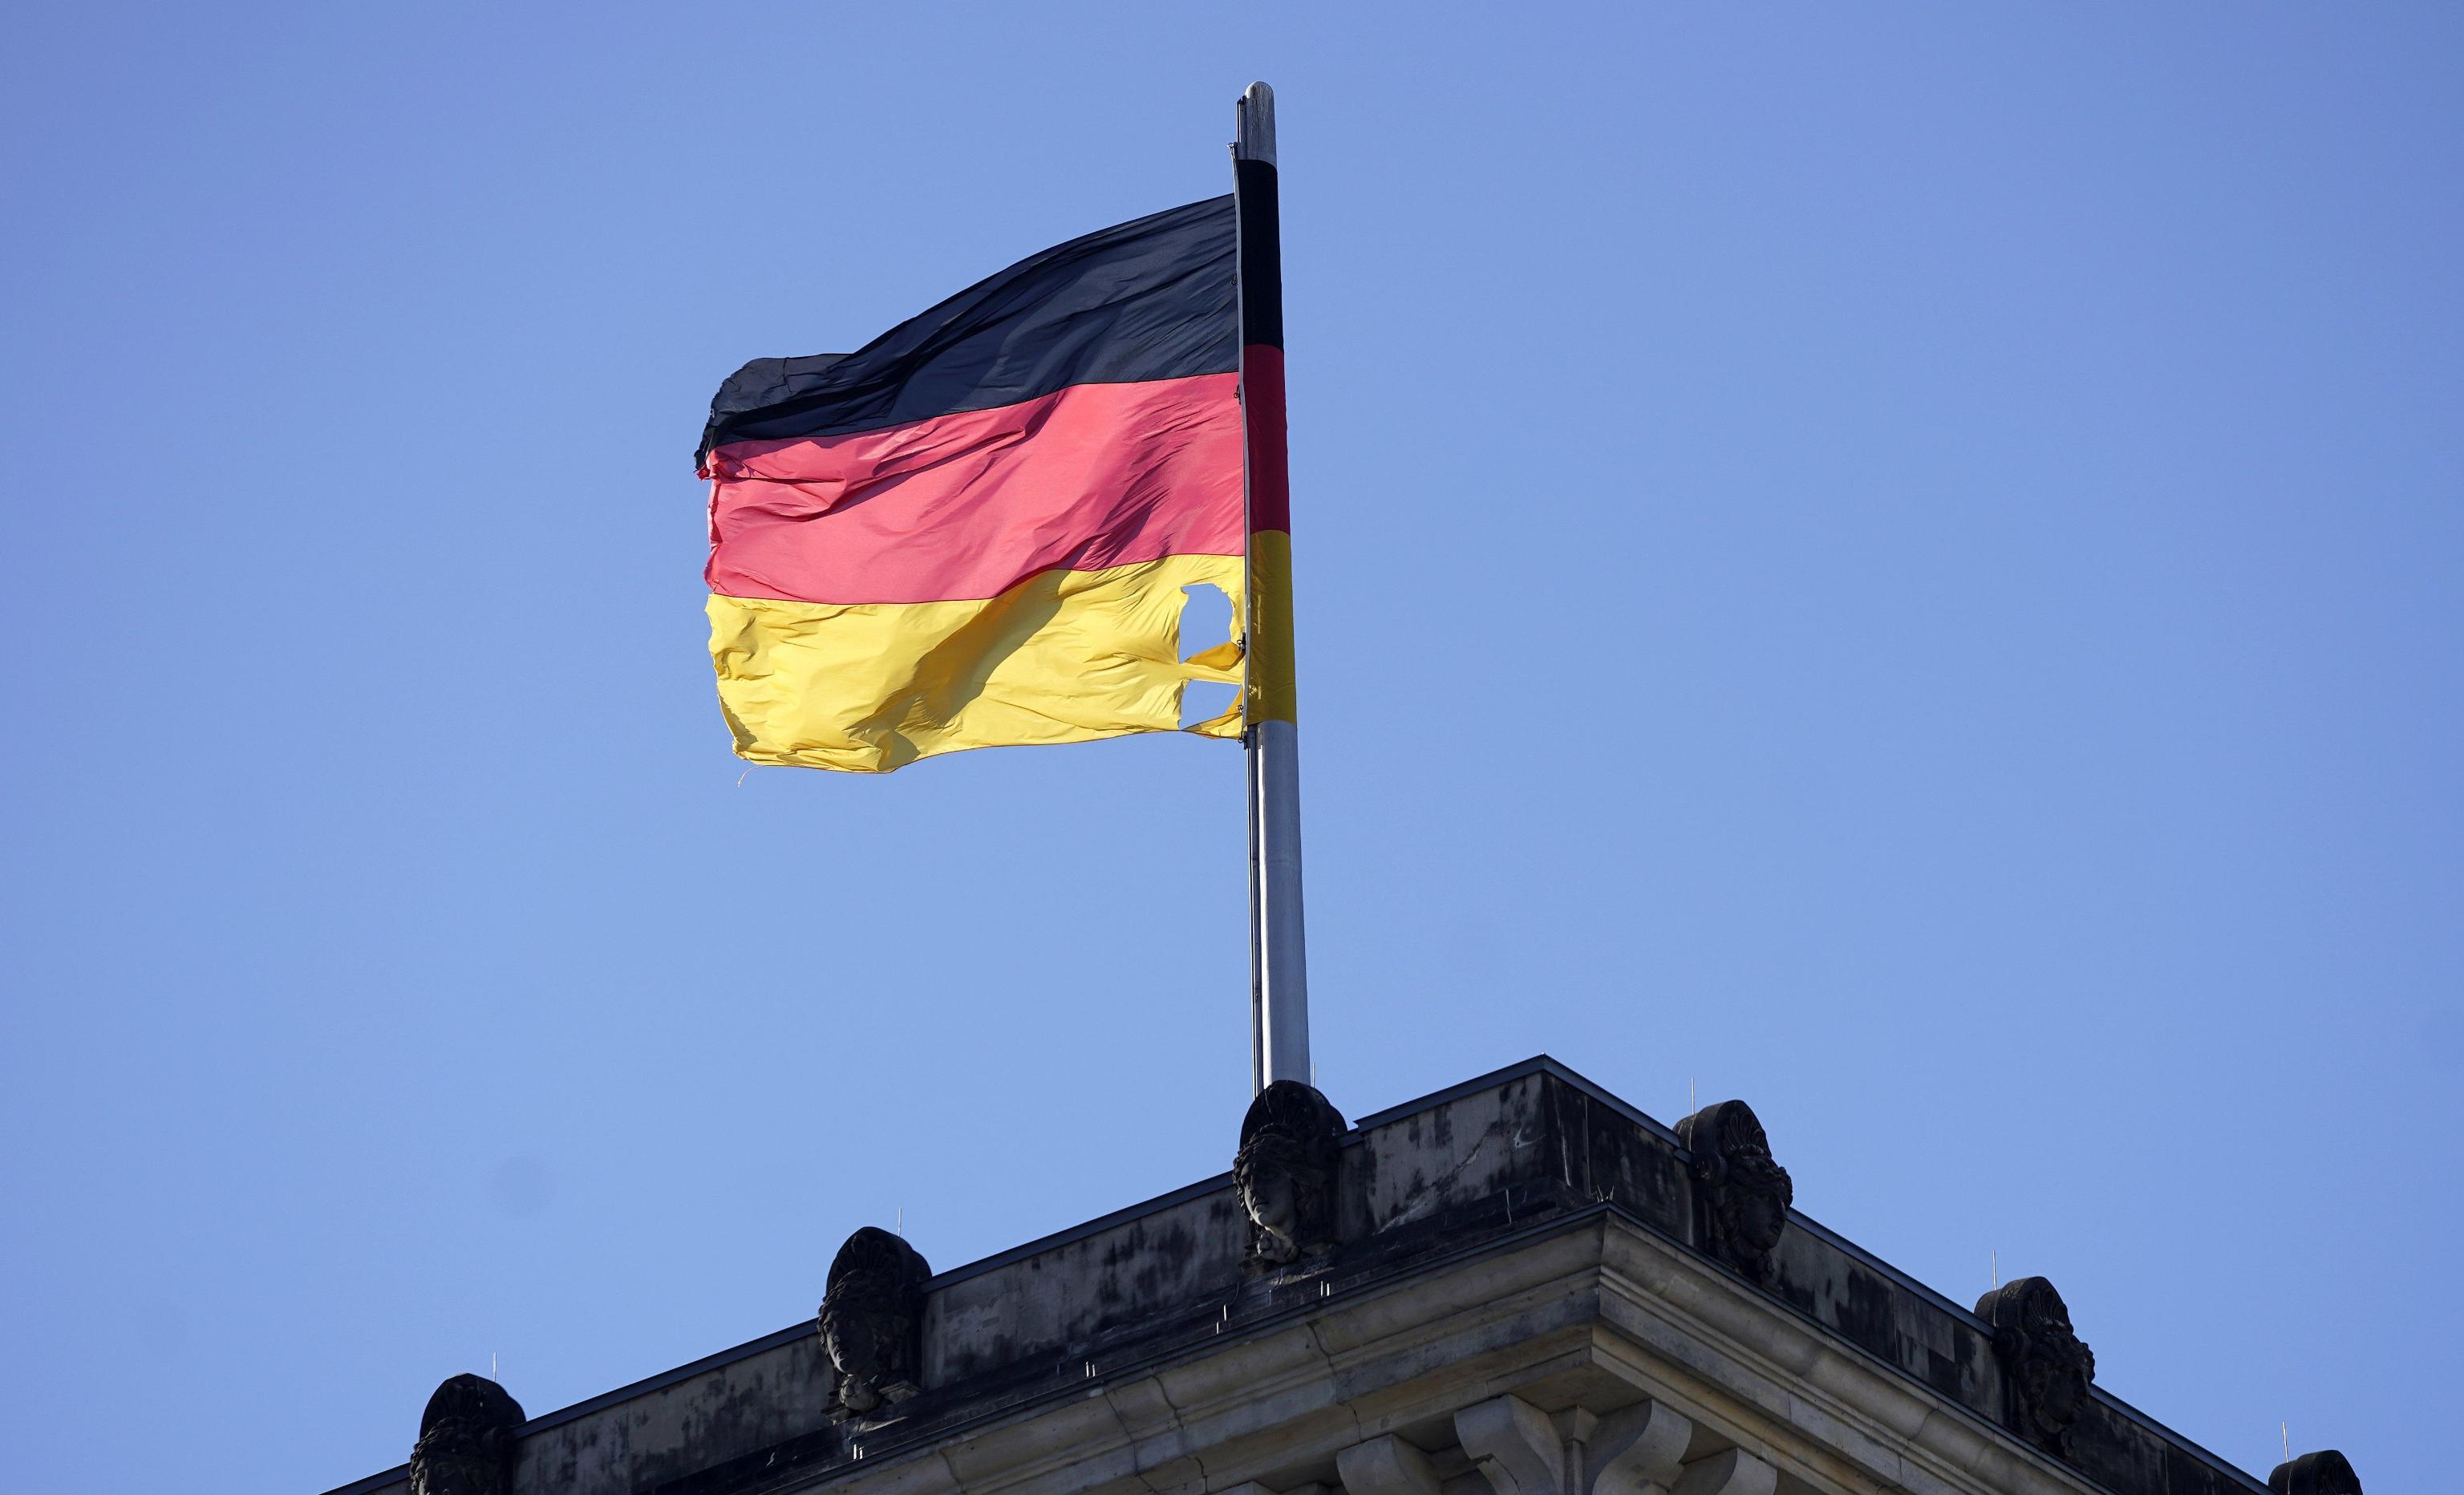 Germania: Pil trimestrale sopra le stime